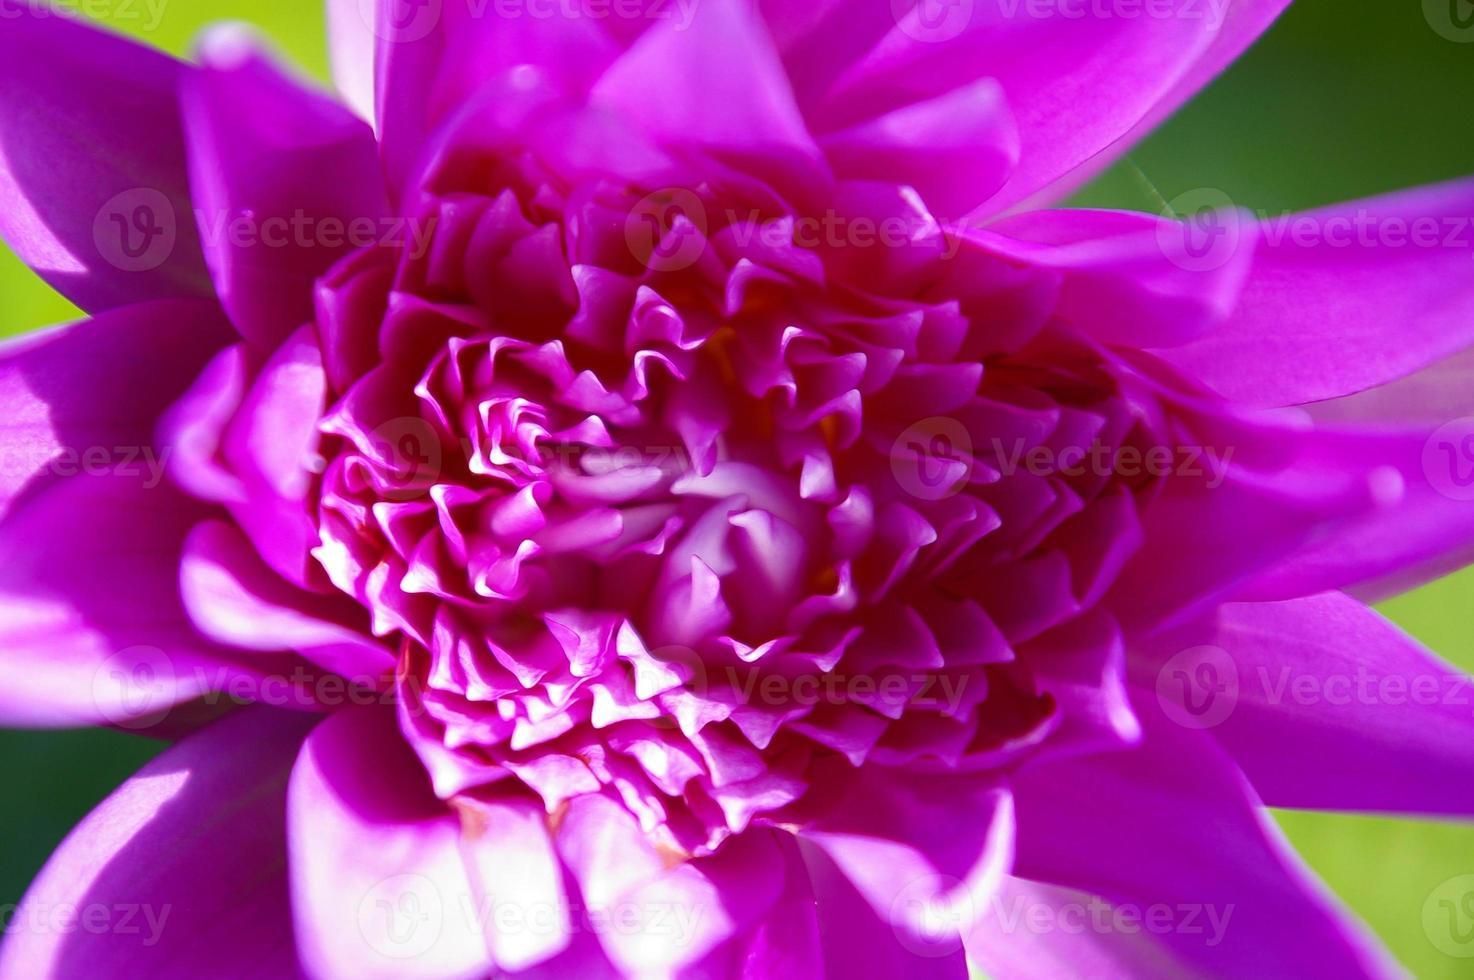 mooie roze lotus of waterlelie bloemen bloeien op vijver foto